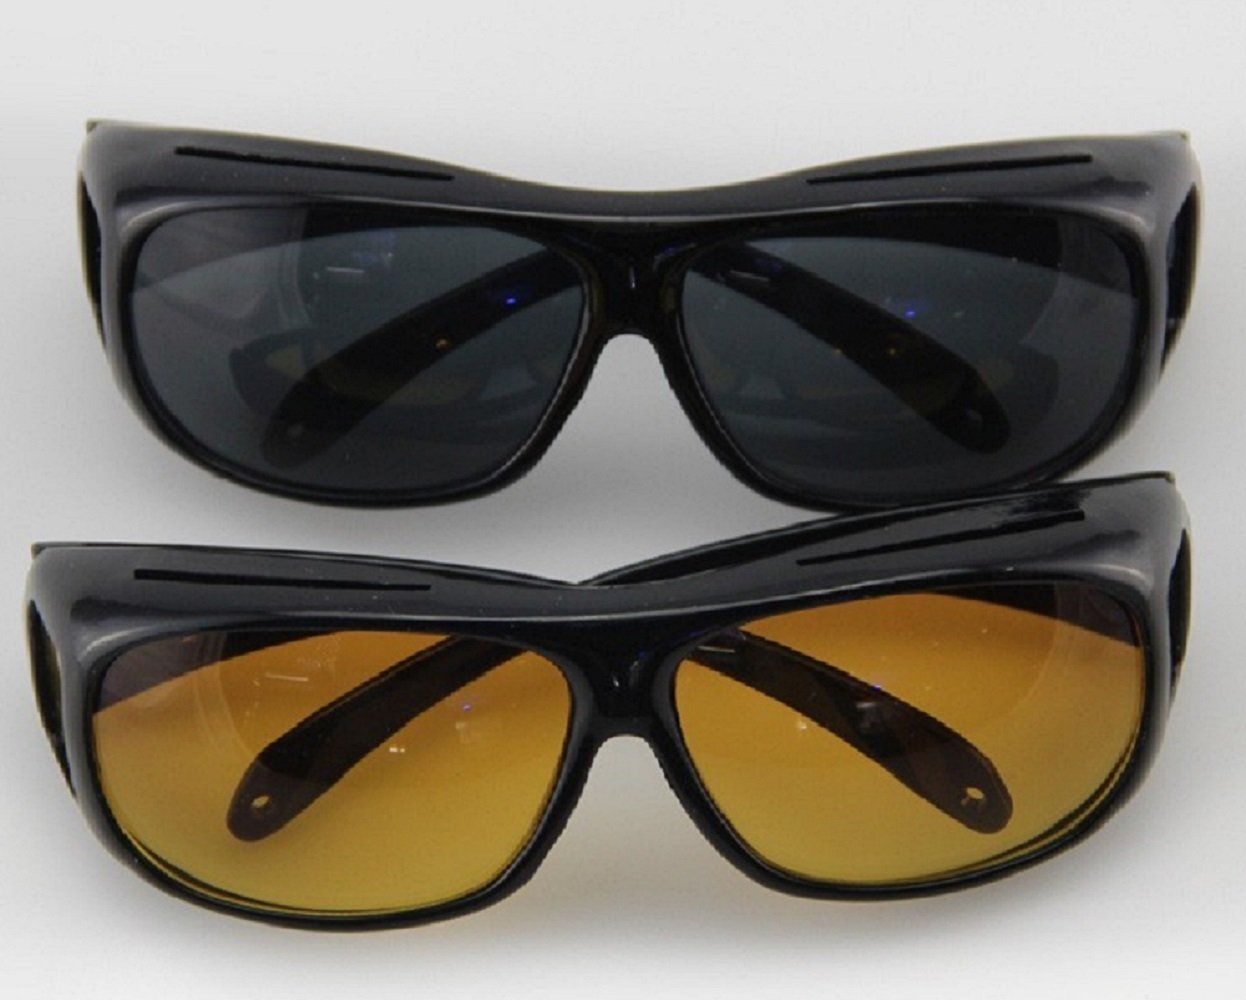 1ebcbb124ed Amazon.com   2Pcs HD Night Vision Ultra Sunglasses   Sports   Outdoors